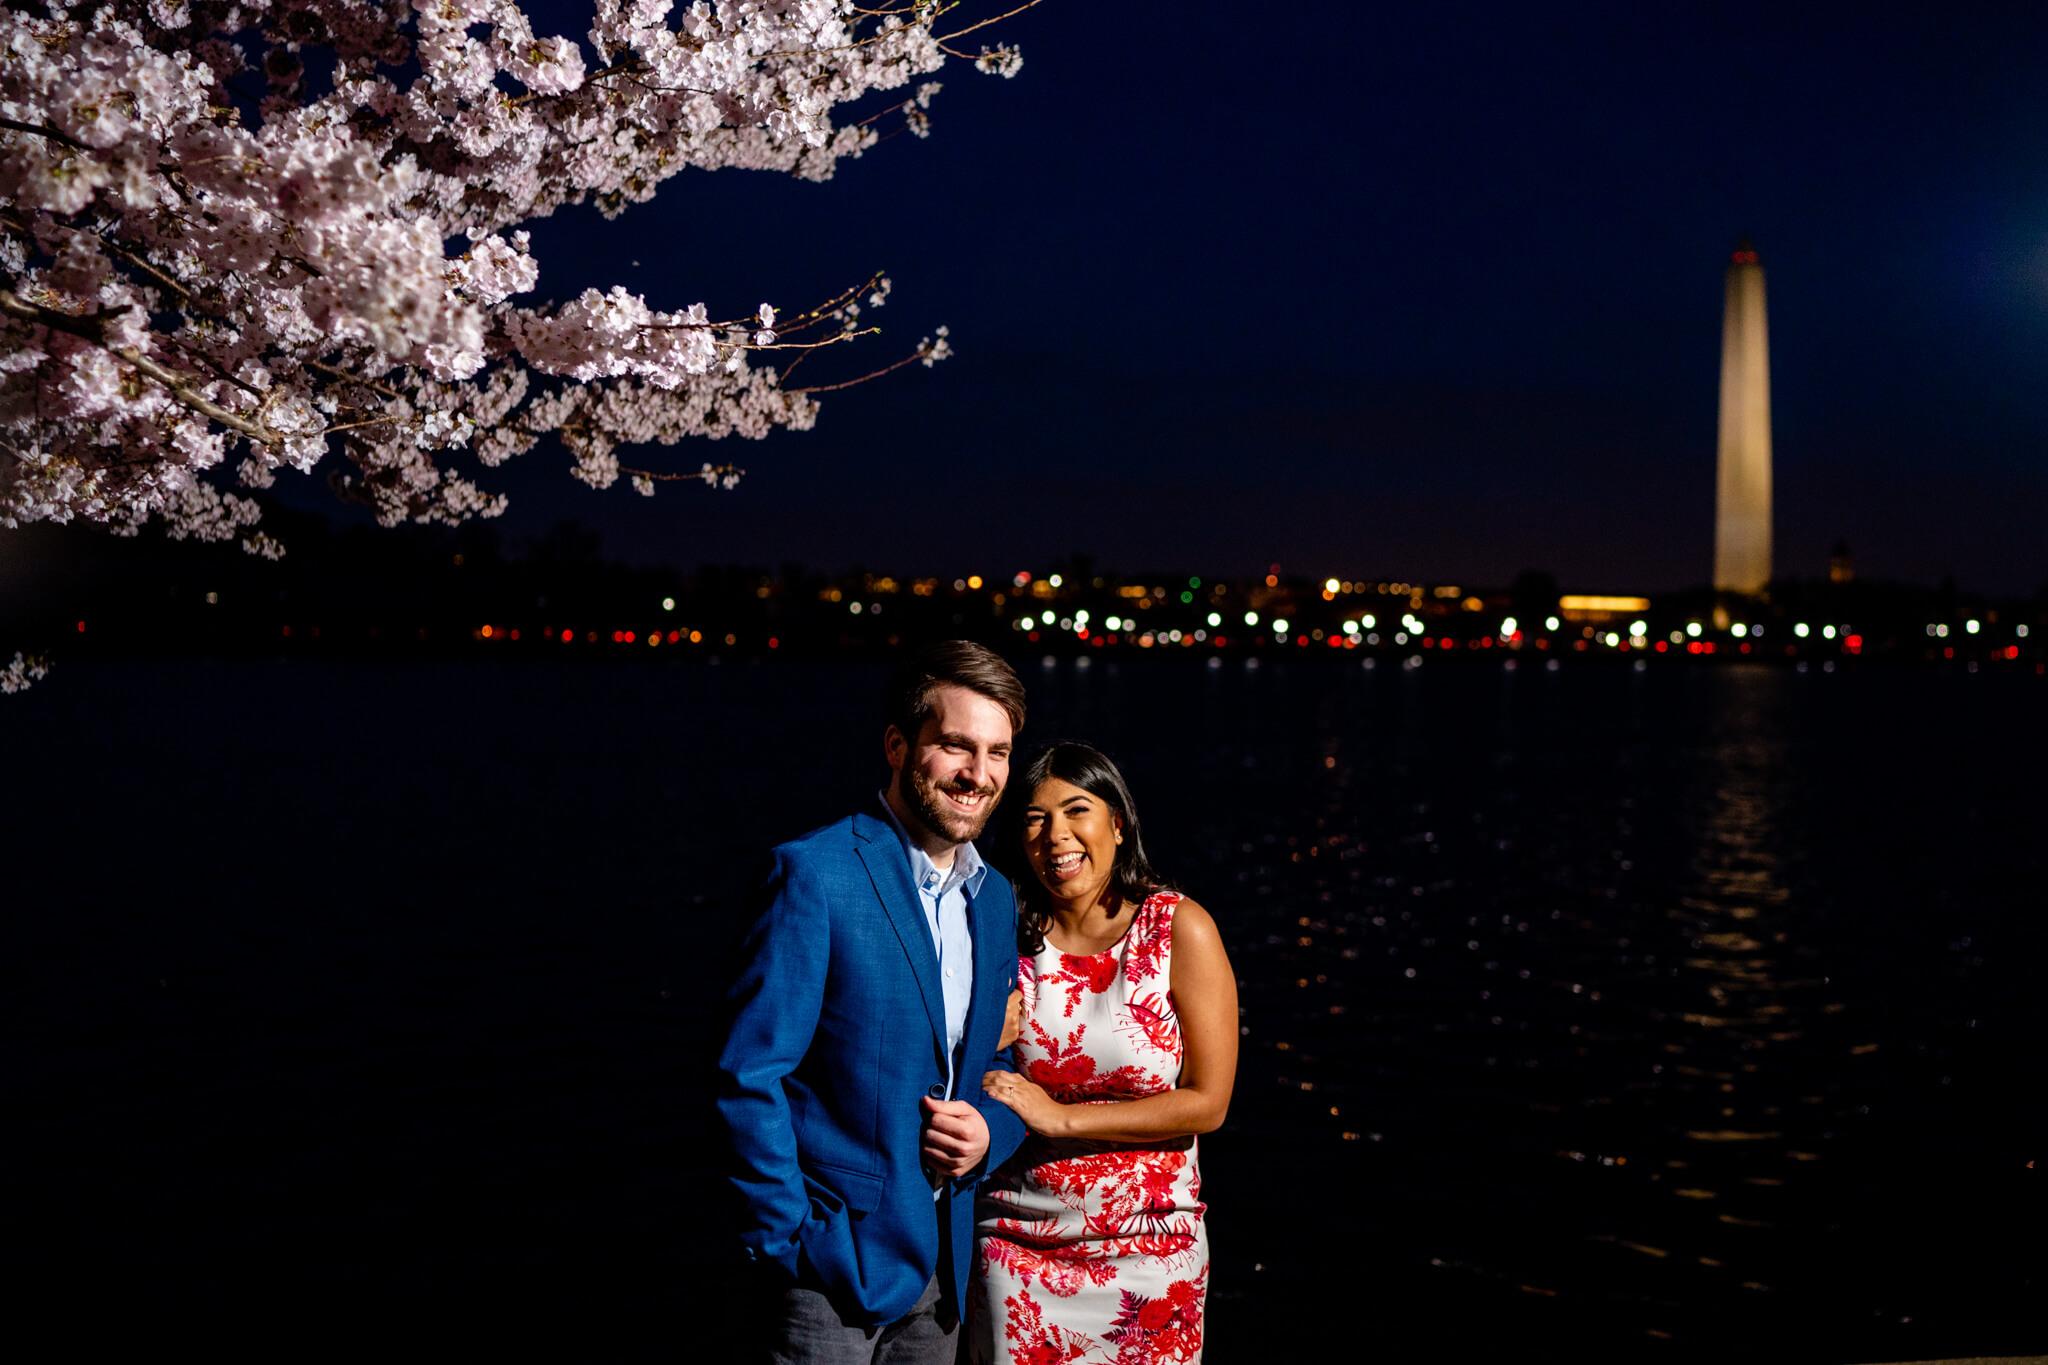 Danielle Michael DC Cherry Blossom Engagement Tidal Basin Washington Monument Engaged NYE Wedding Inspiration-4.jpg